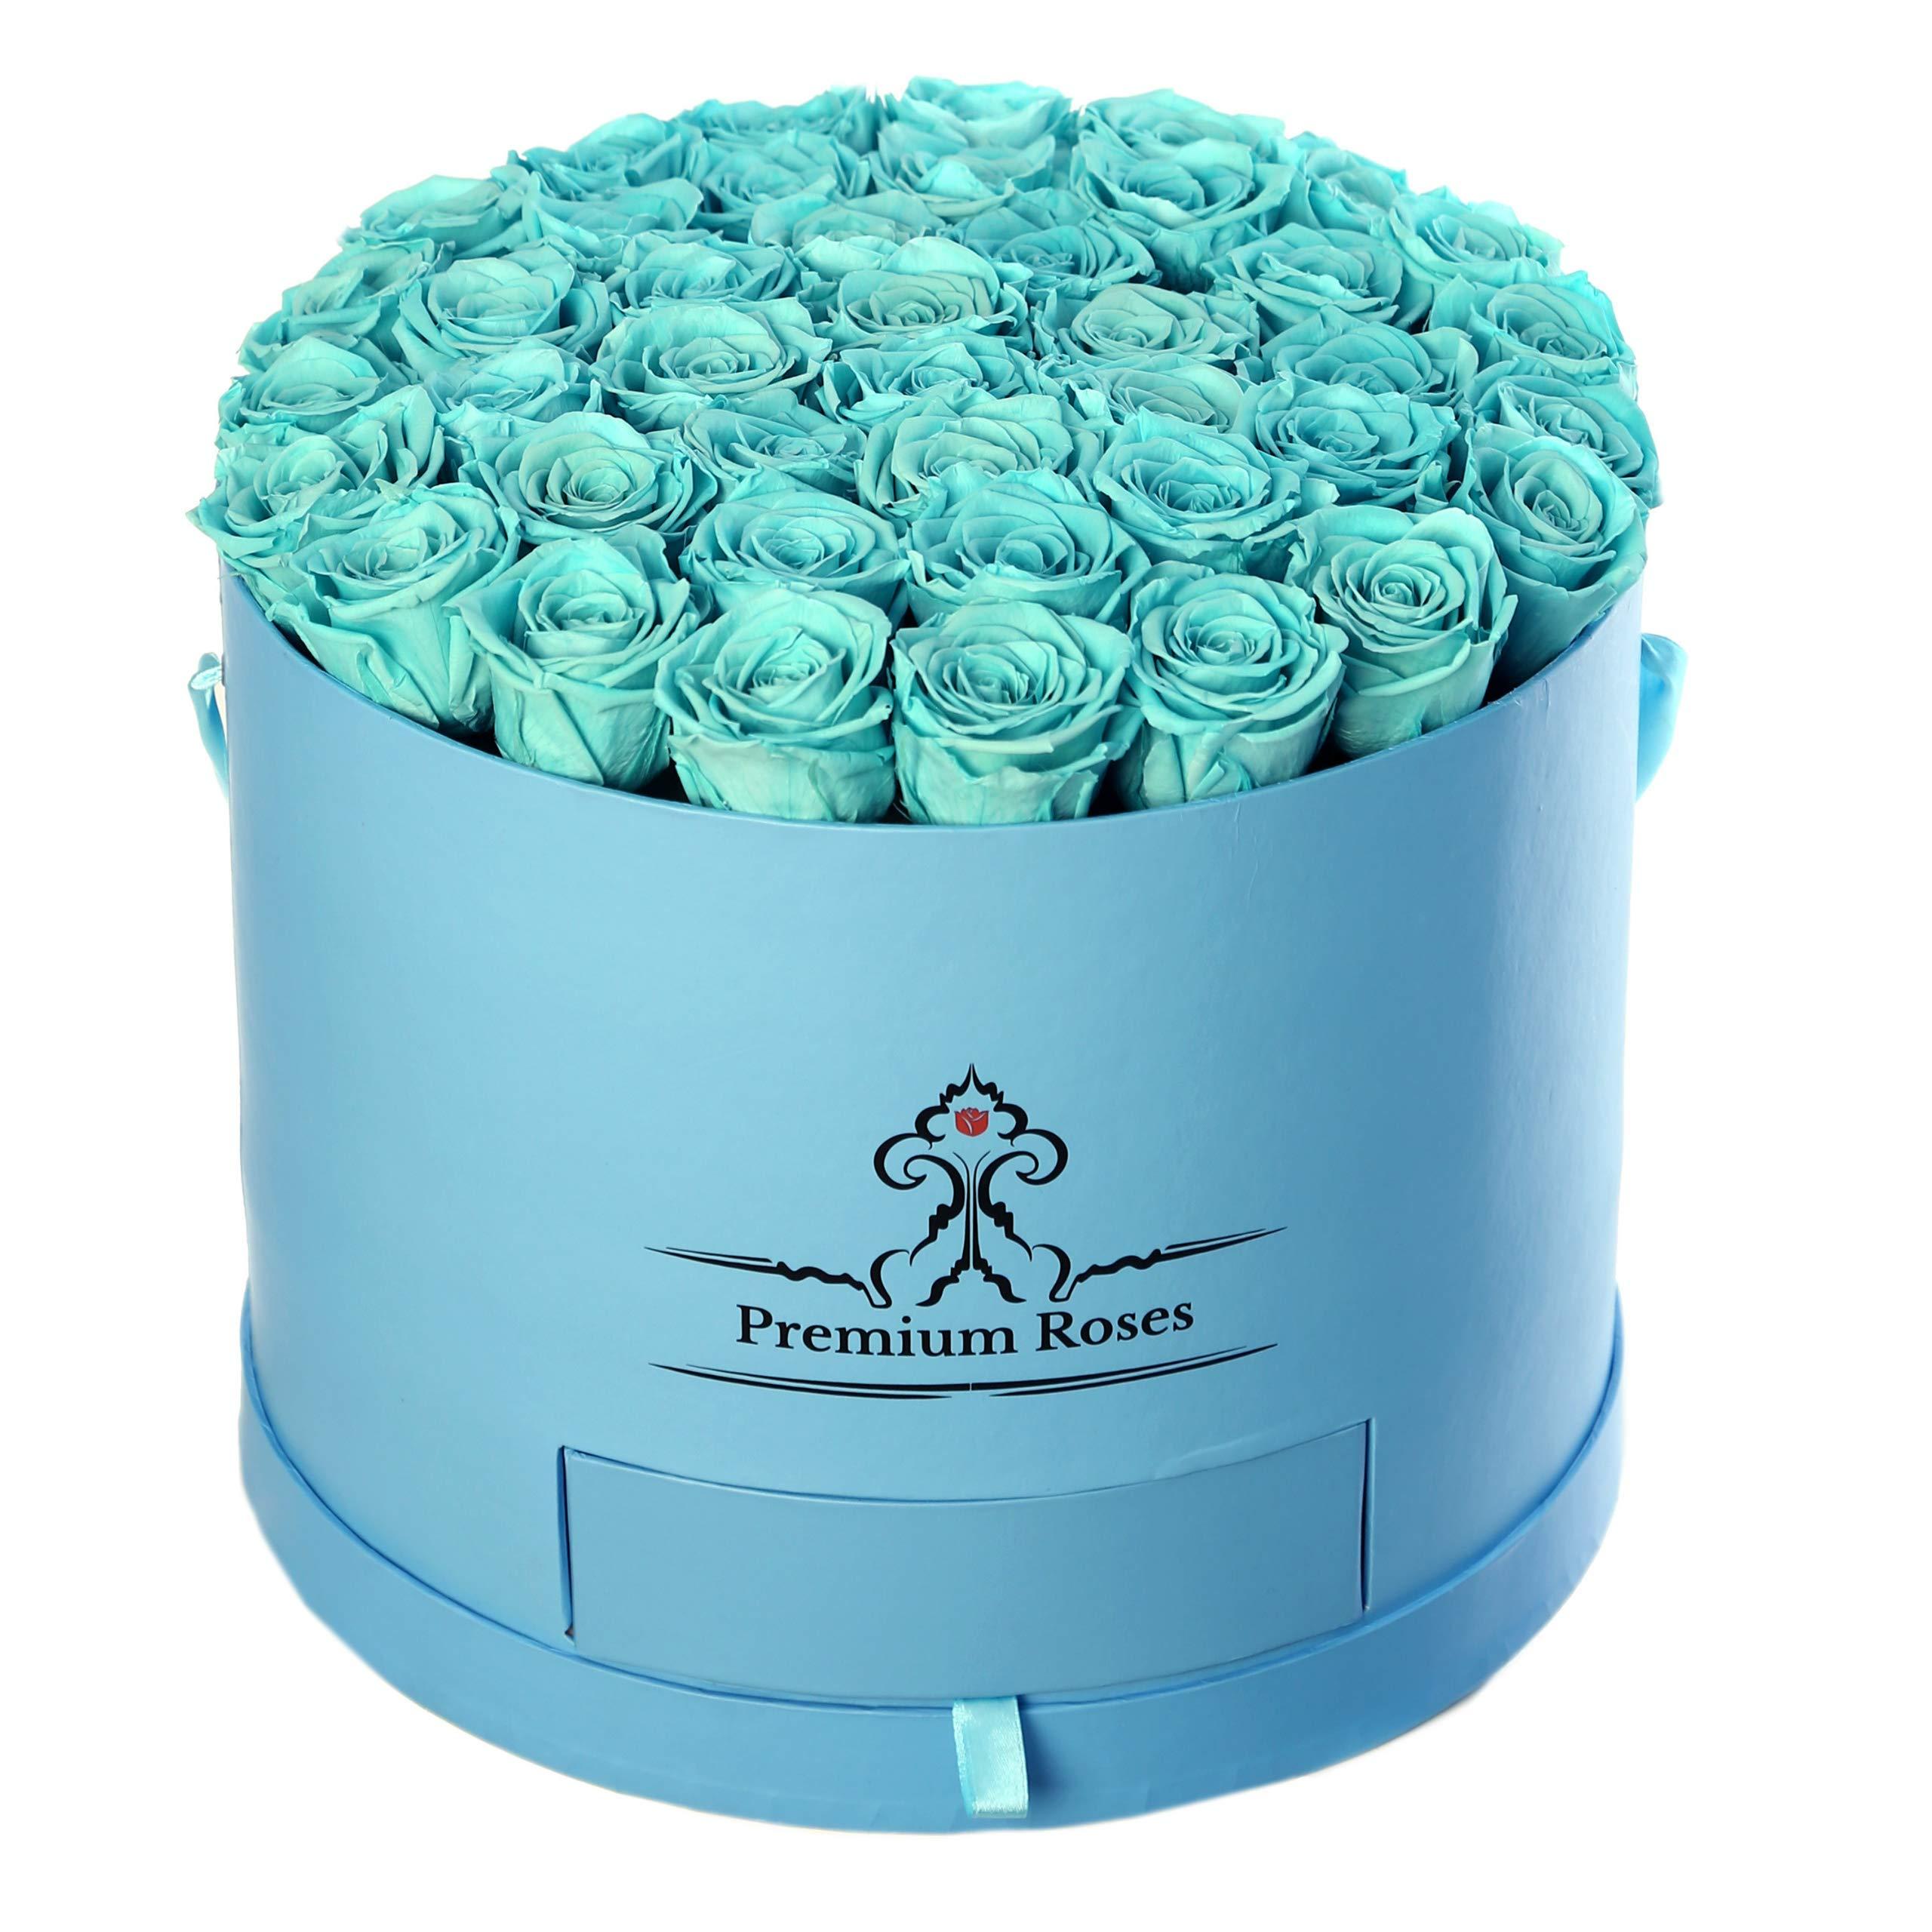 Premium Roses| Model Sky Blue| Real Roses That Last 365 Days| Fresh Flowers (Blue Box)